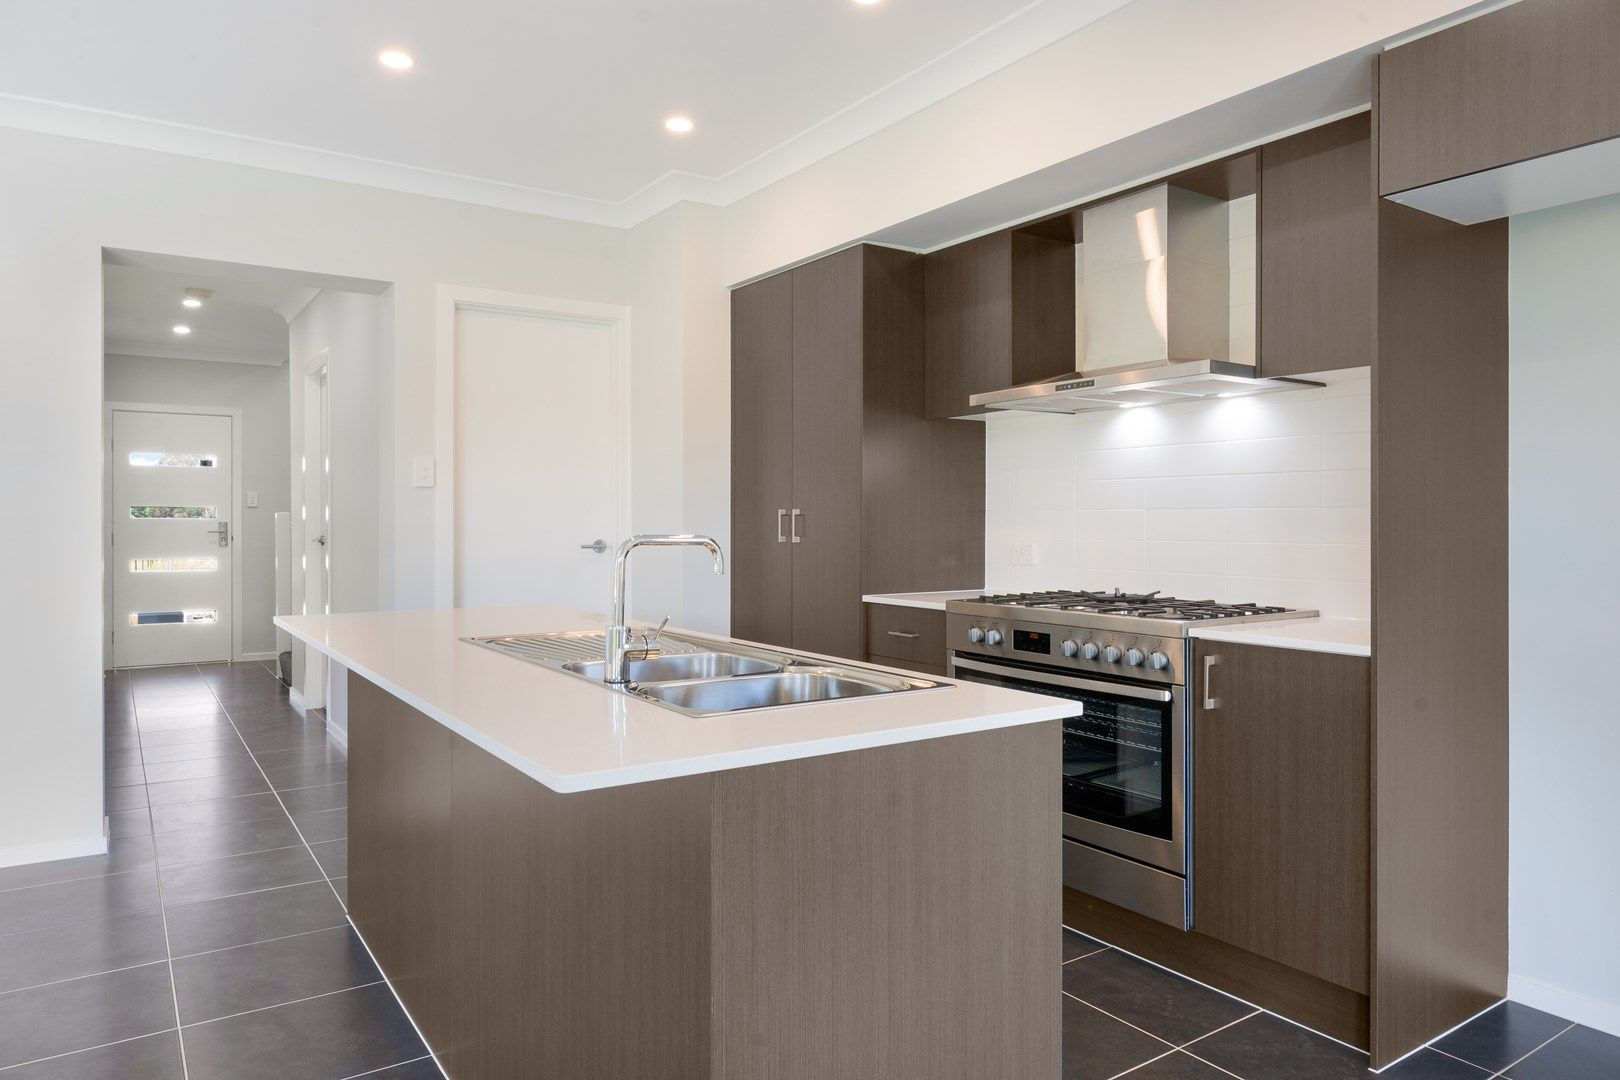 33 Learoyd Road, Edmondson Park NSW 2174, Image 0